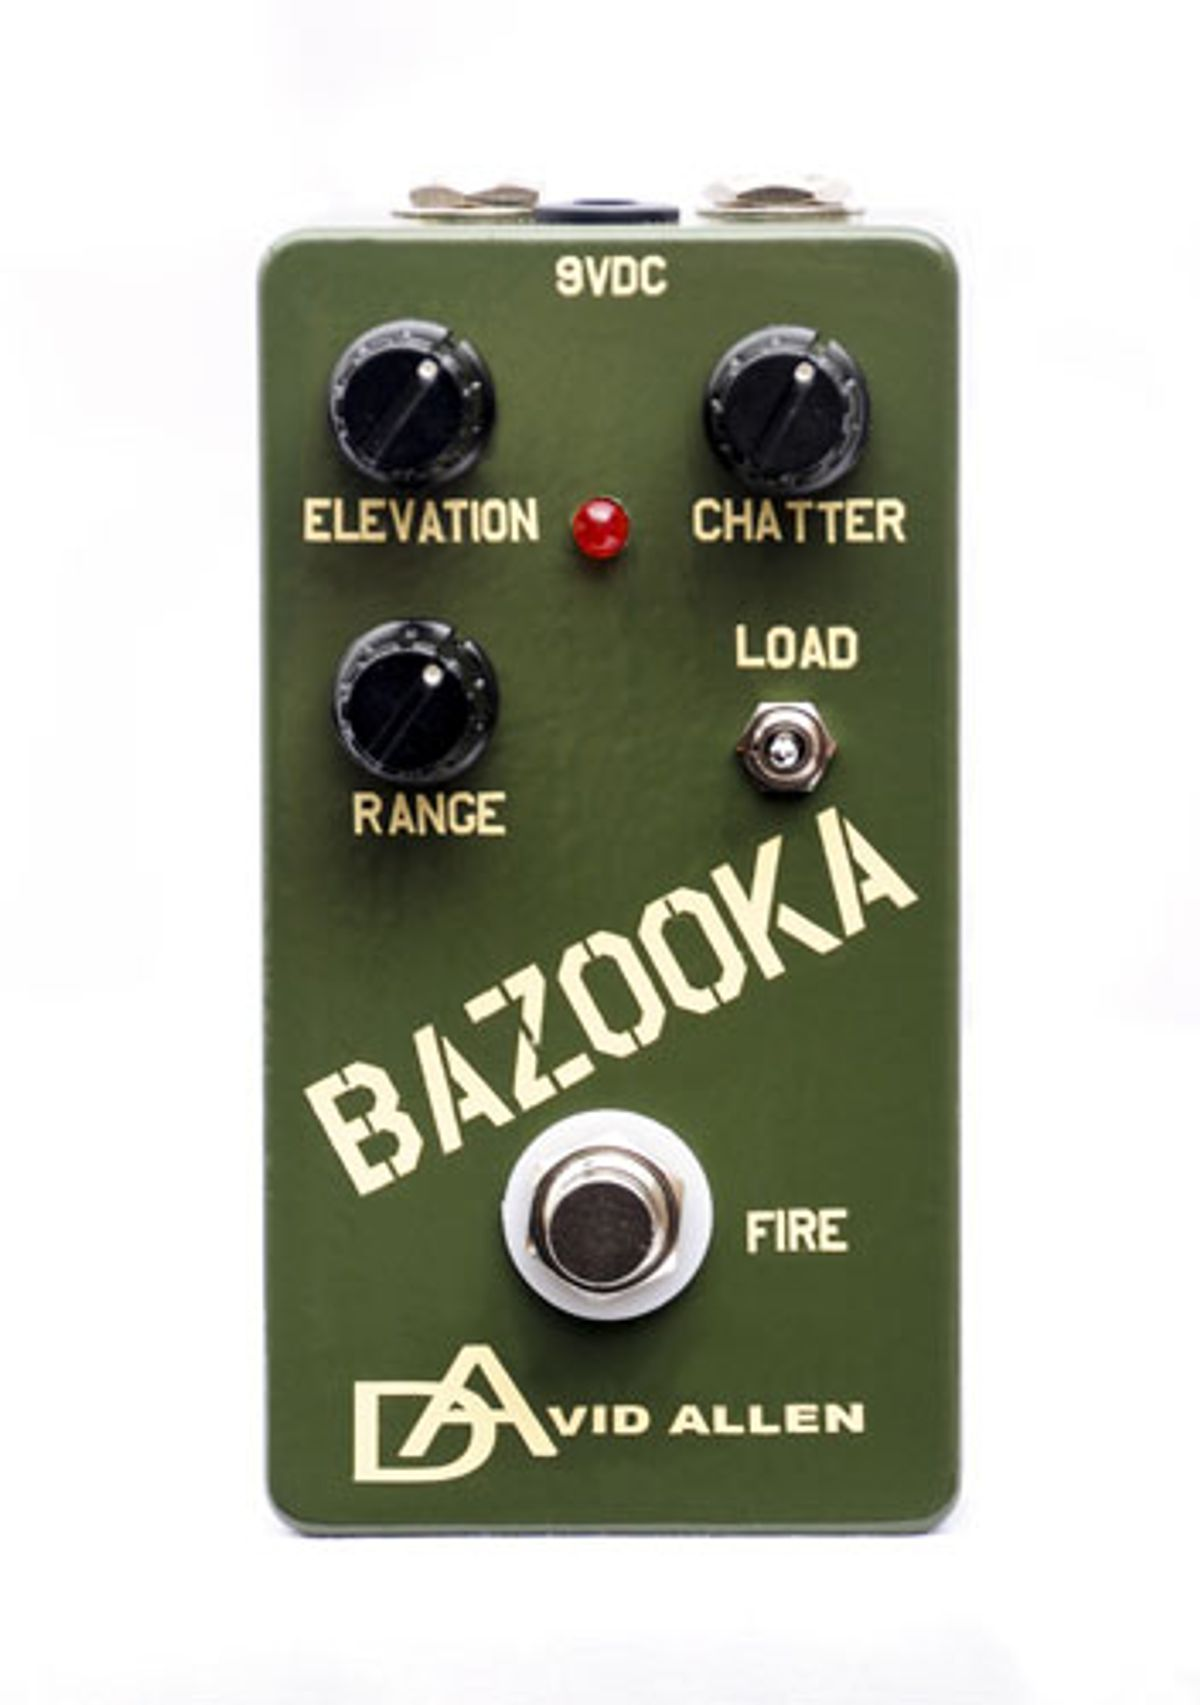 David Allen Pickups Announces the Bazooka Overdrive Pedal